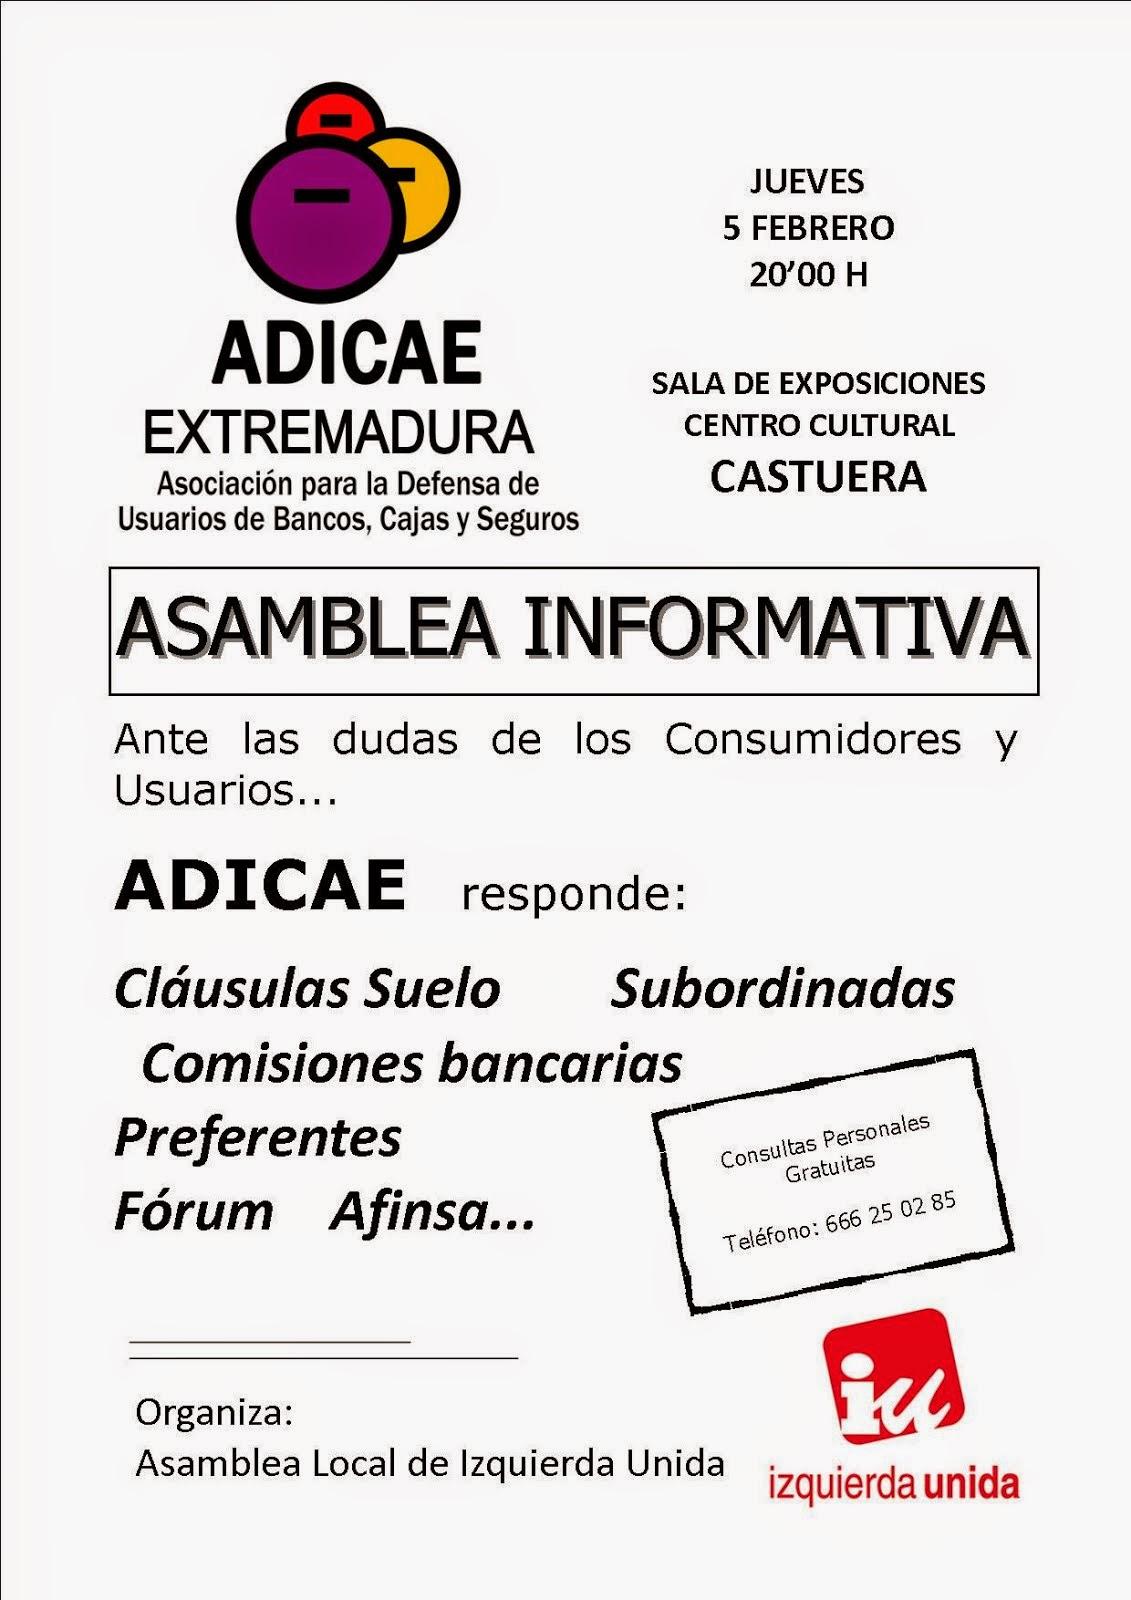 Asamblea Informativa de ADICAE